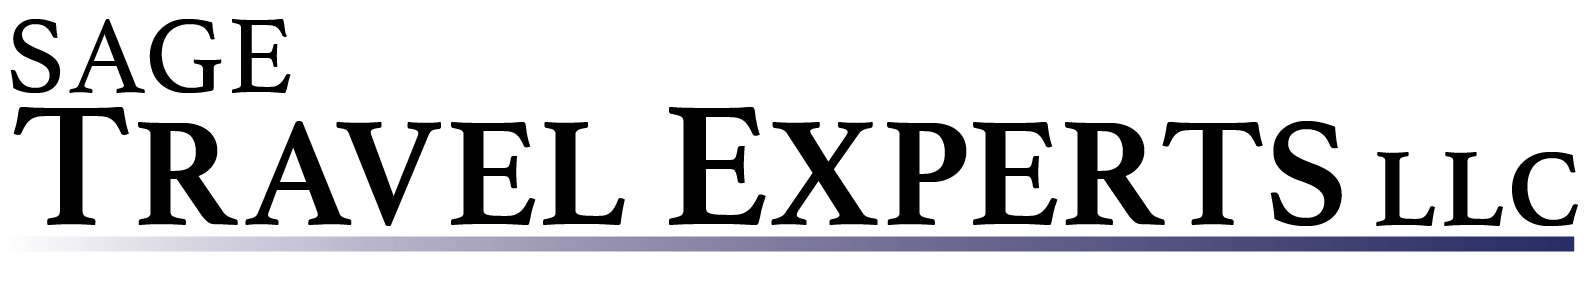 Sage Travel Experts